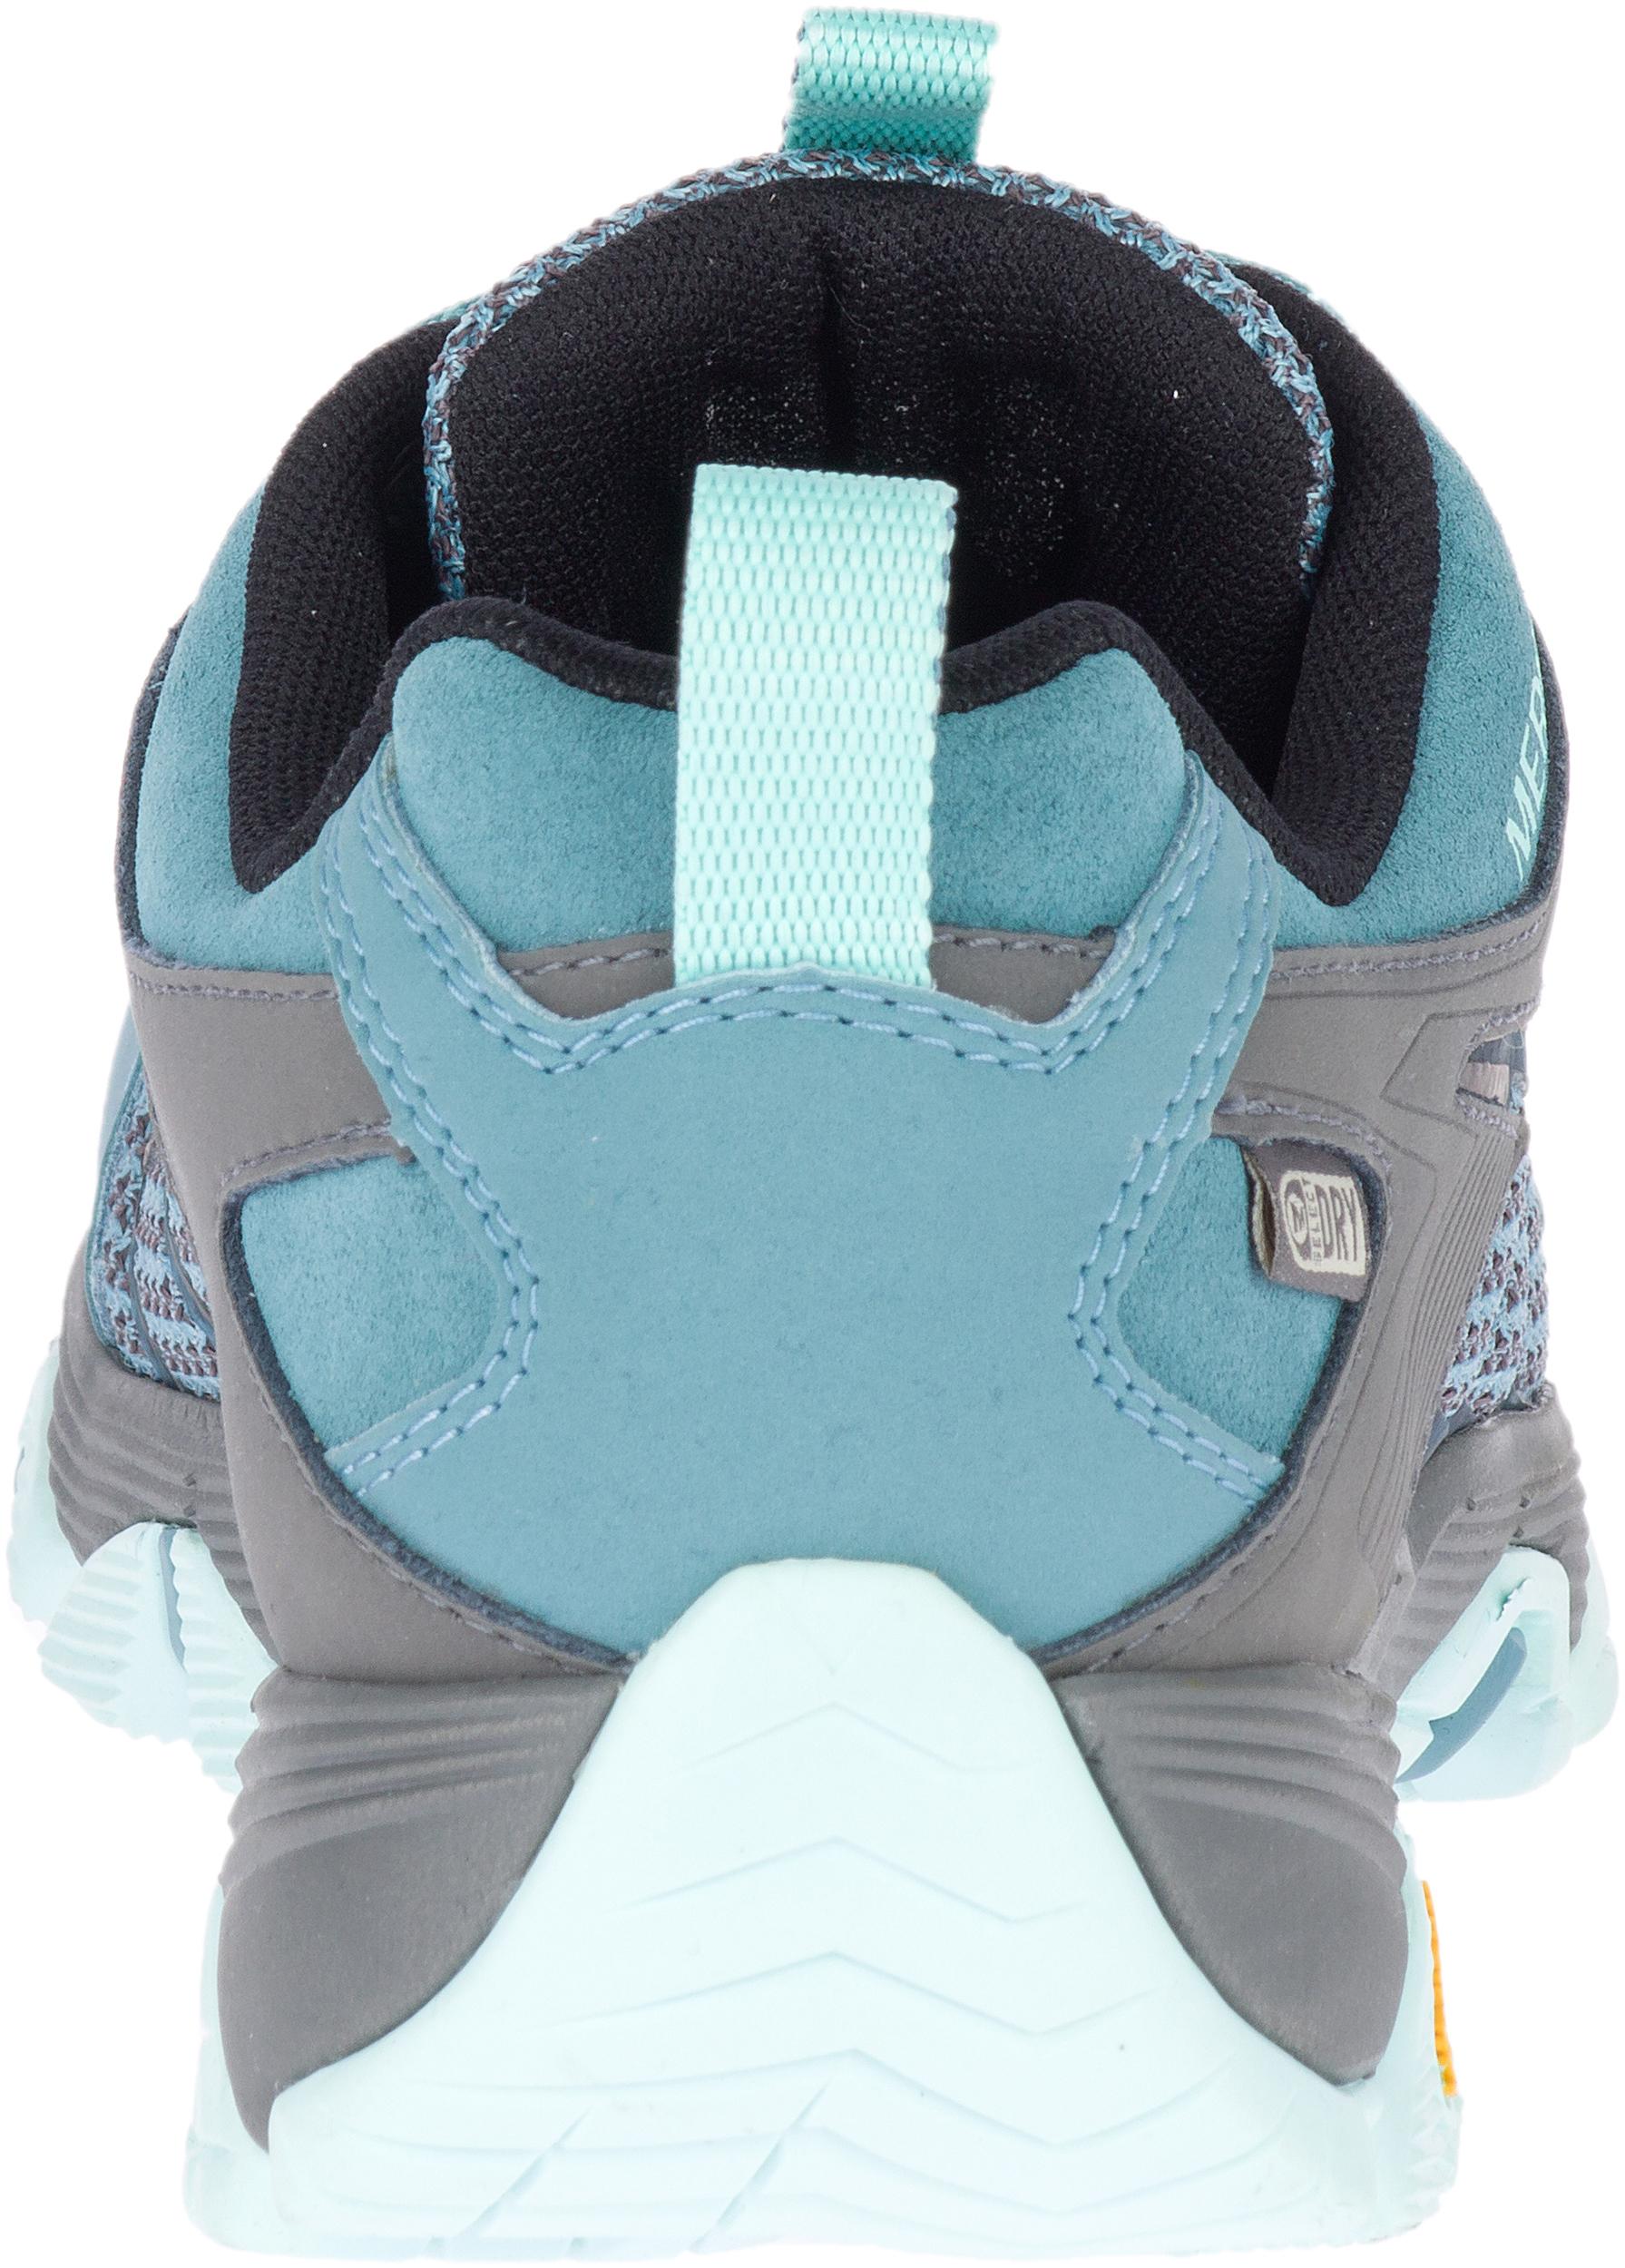 0d9e58ec2d4e Merrell Moab FST II Waterproof Light Trail Shoes - Women s